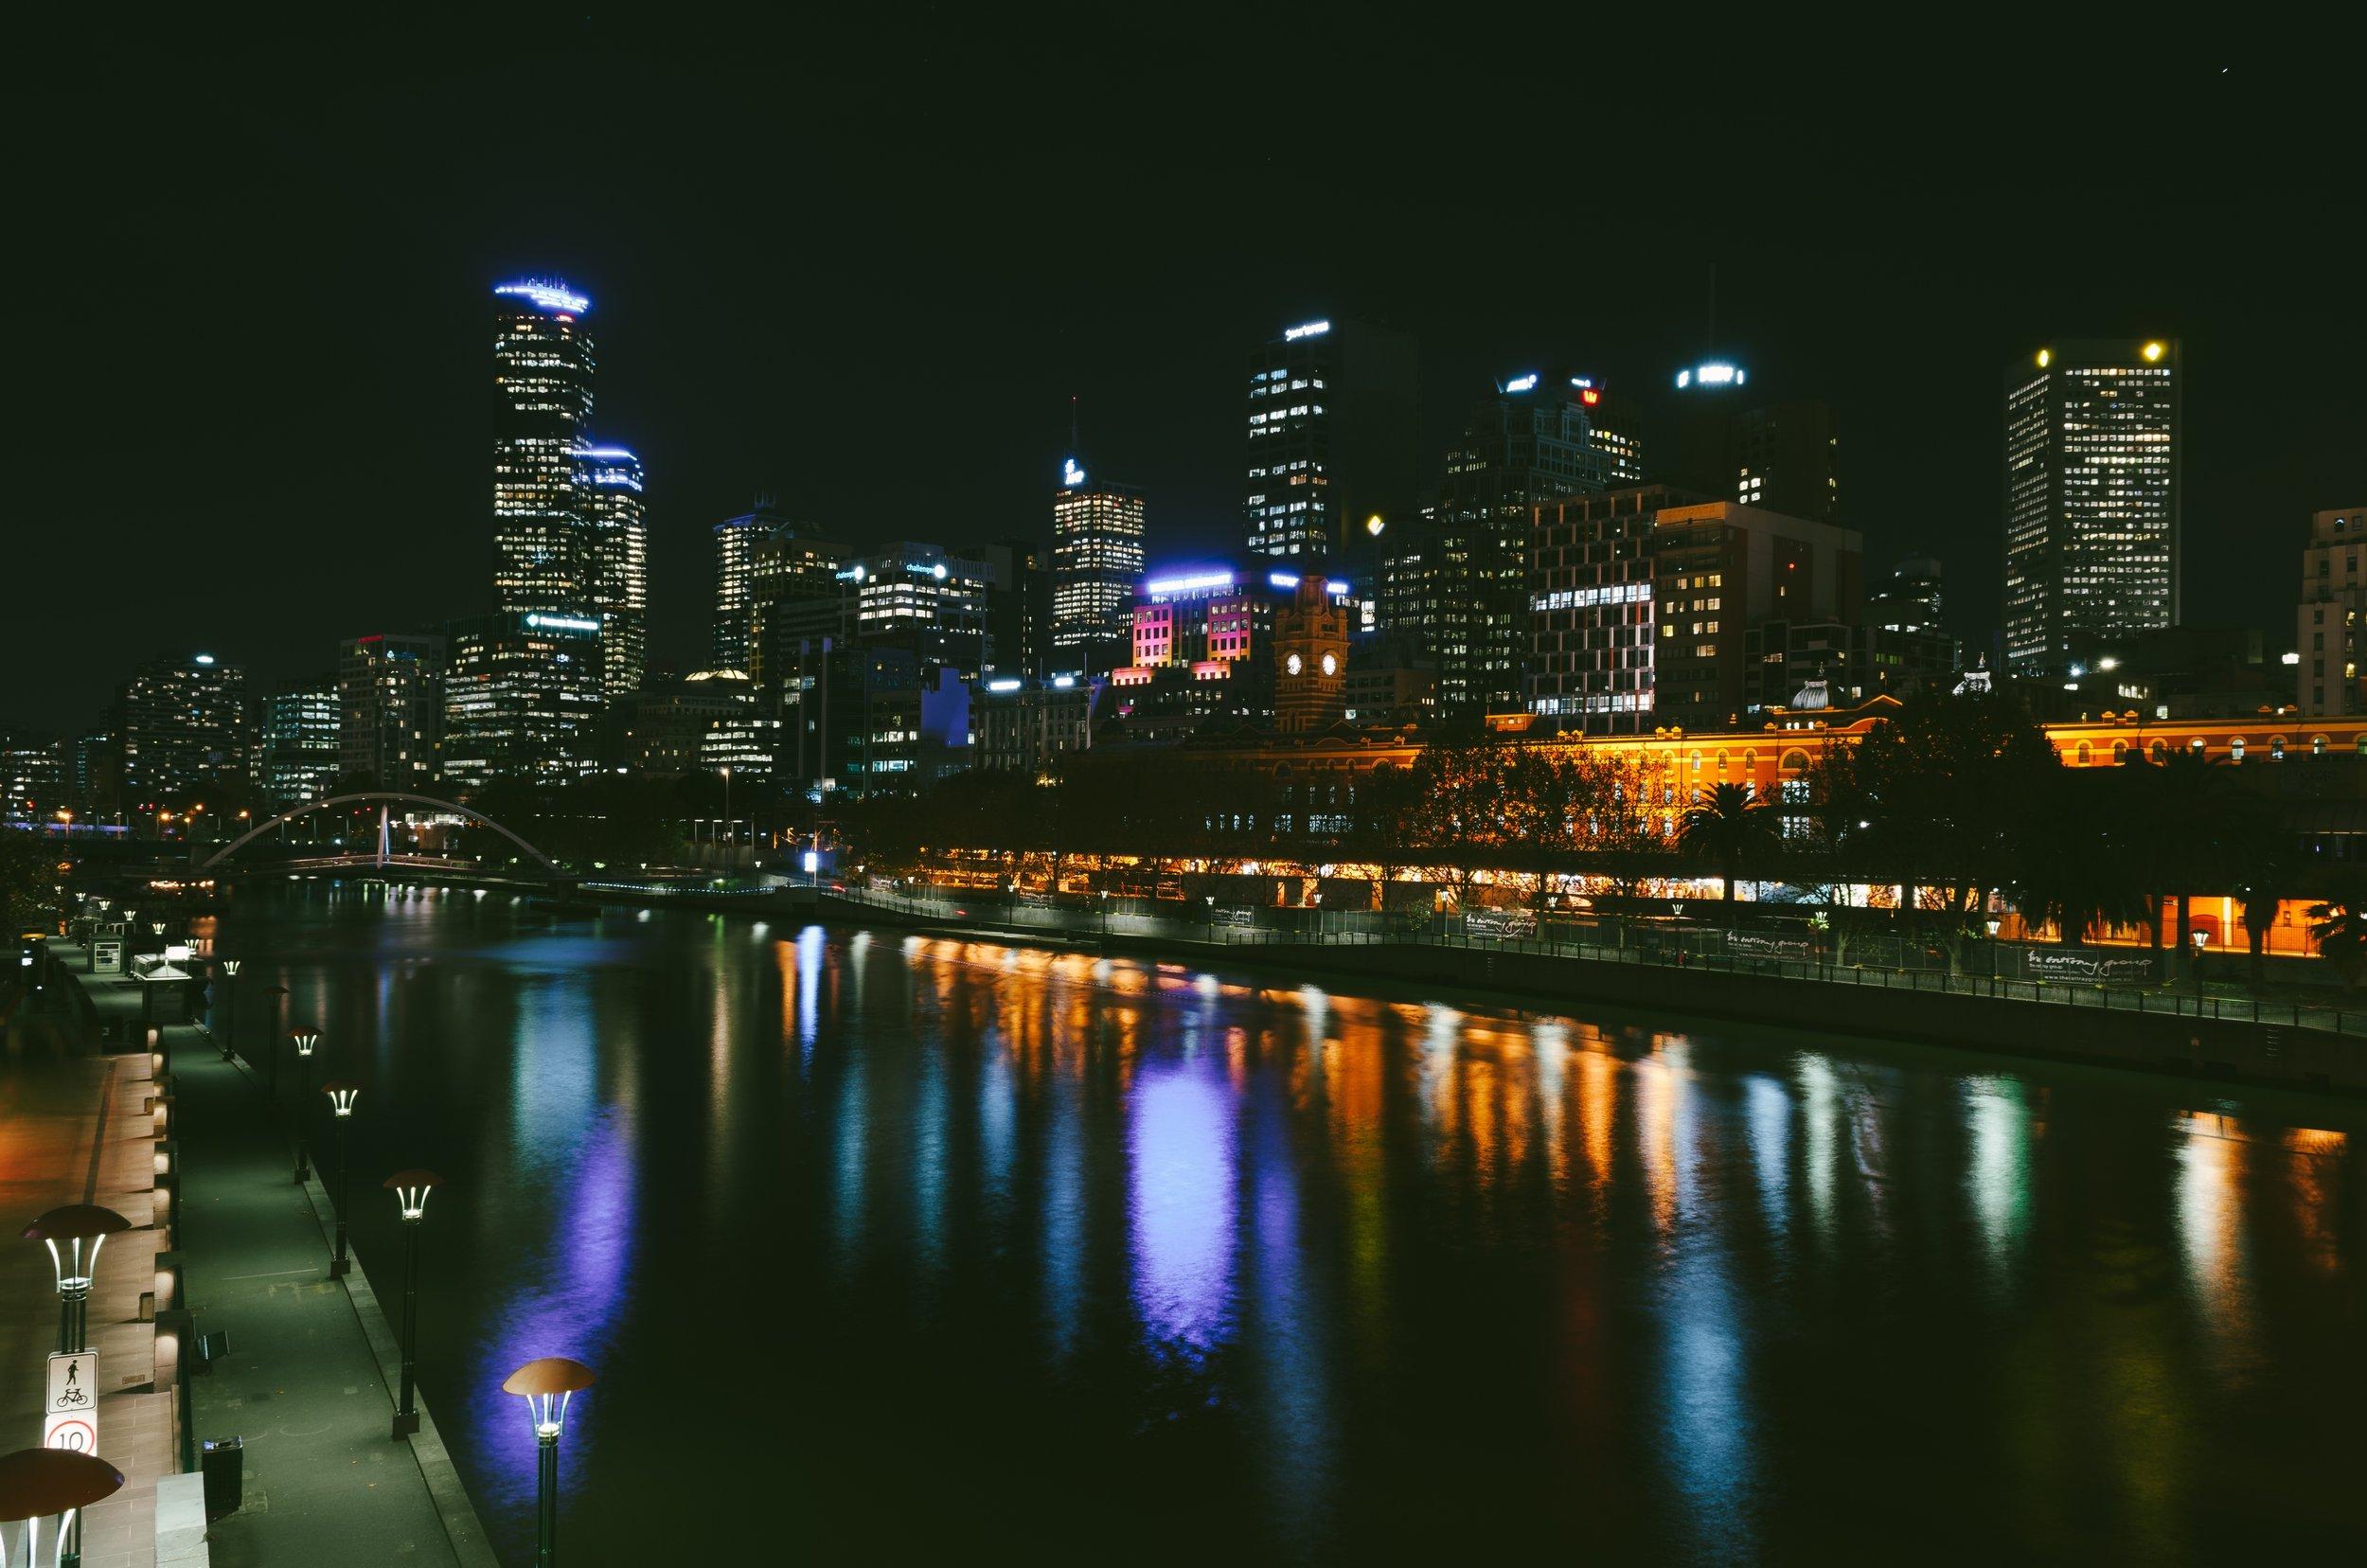 Melbourne at night.jpg